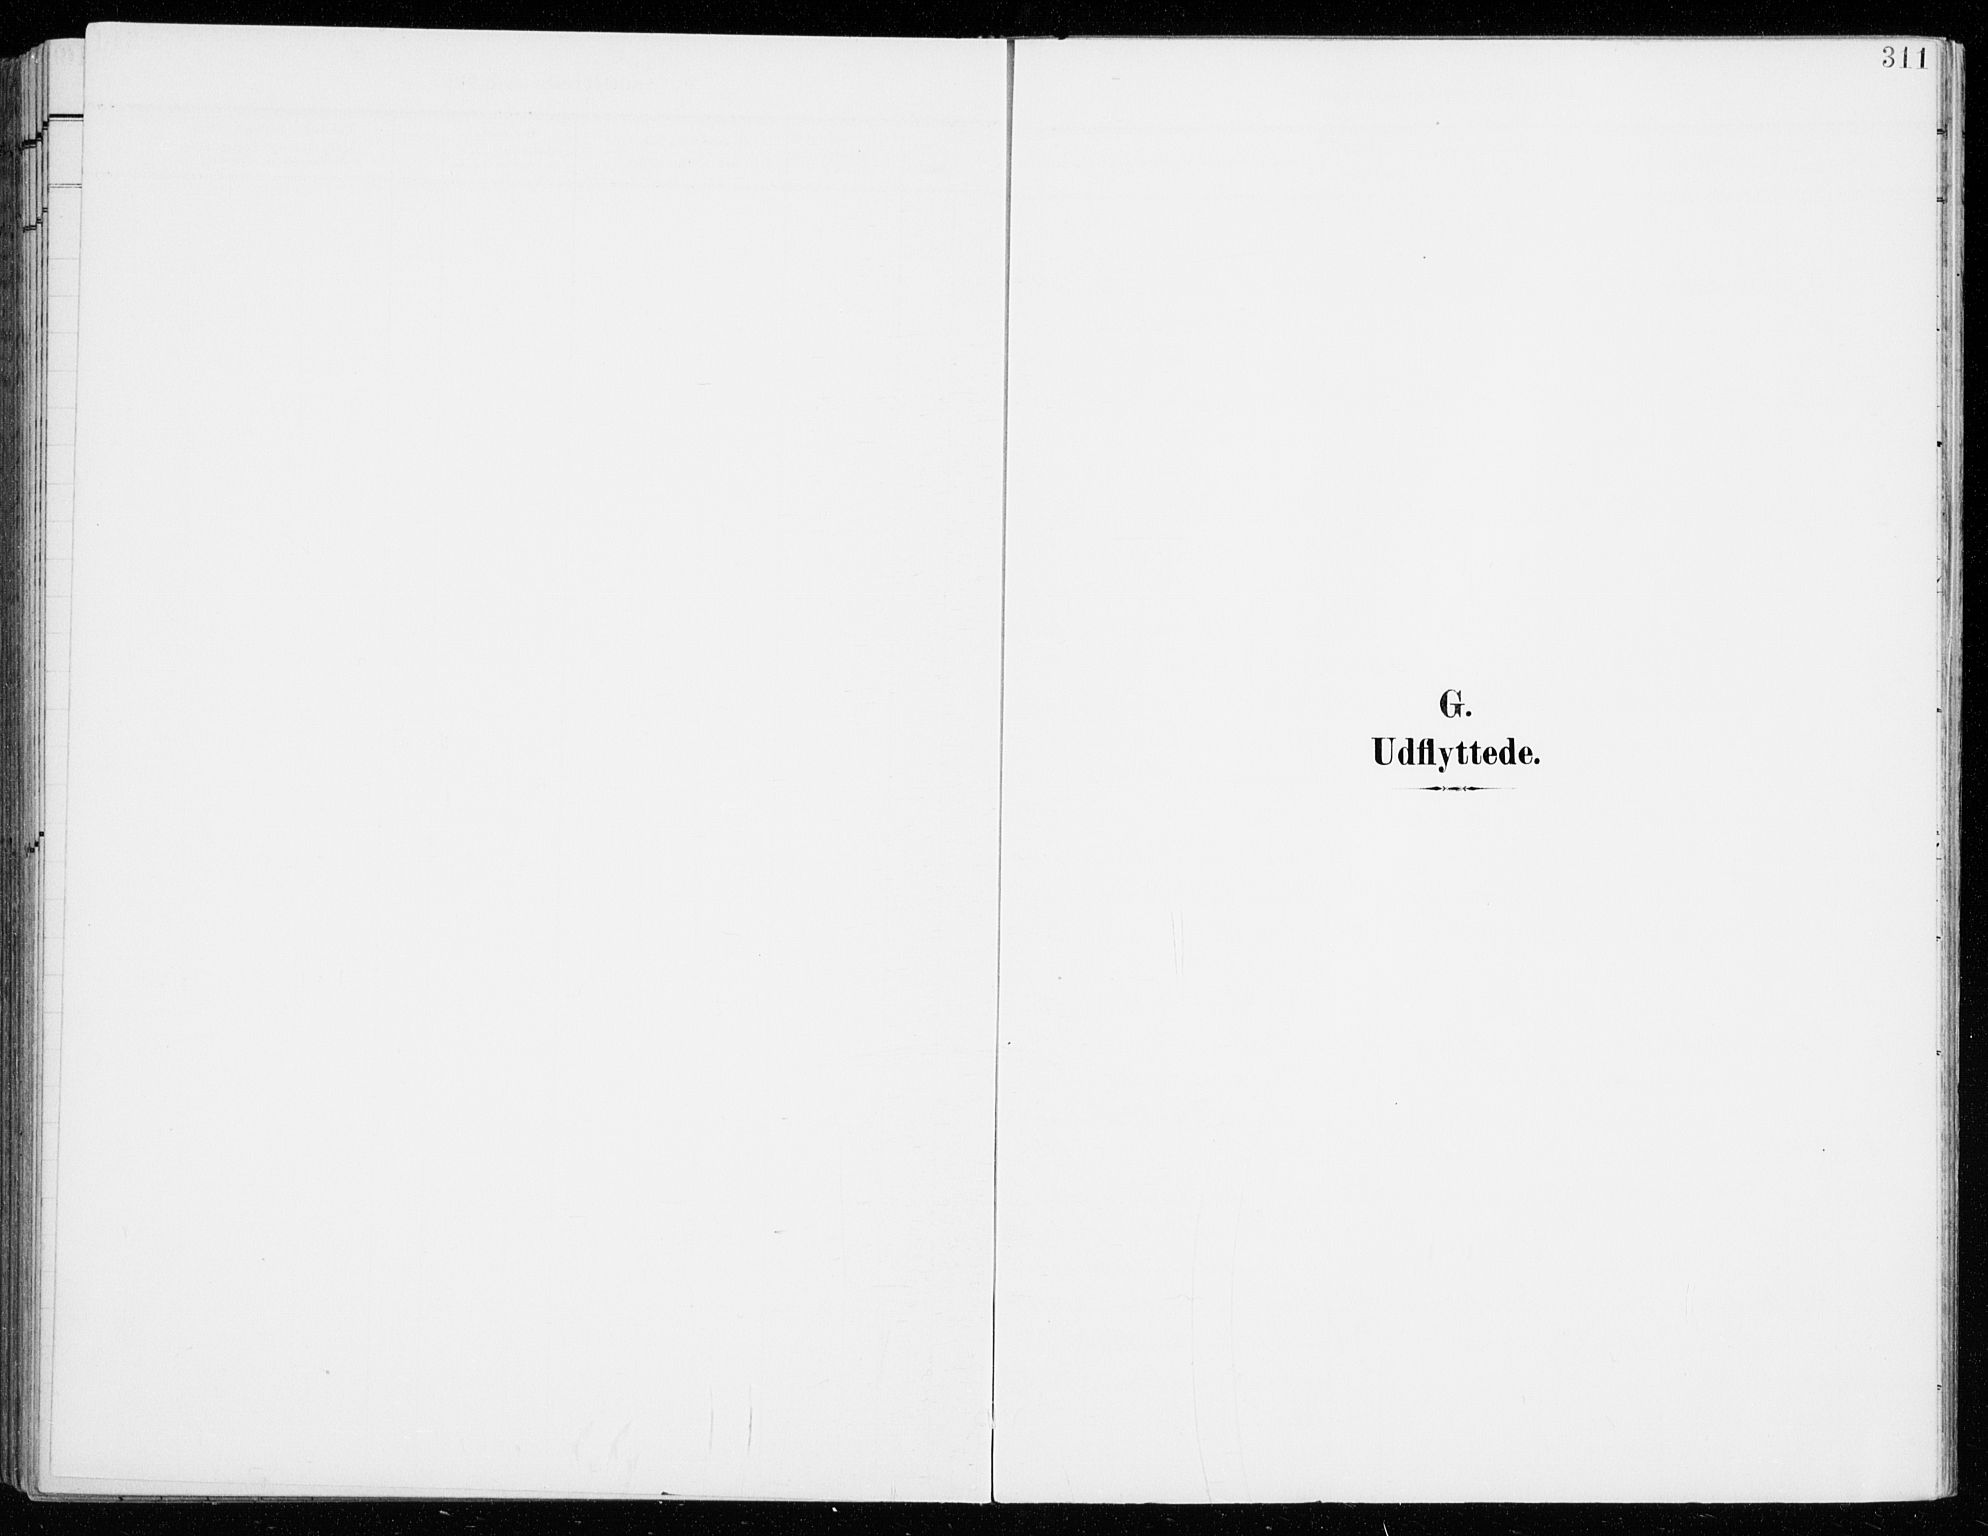 SAH, Fåberg prestekontor, Ministerialbok nr. 11, 1899-1913, s. 311